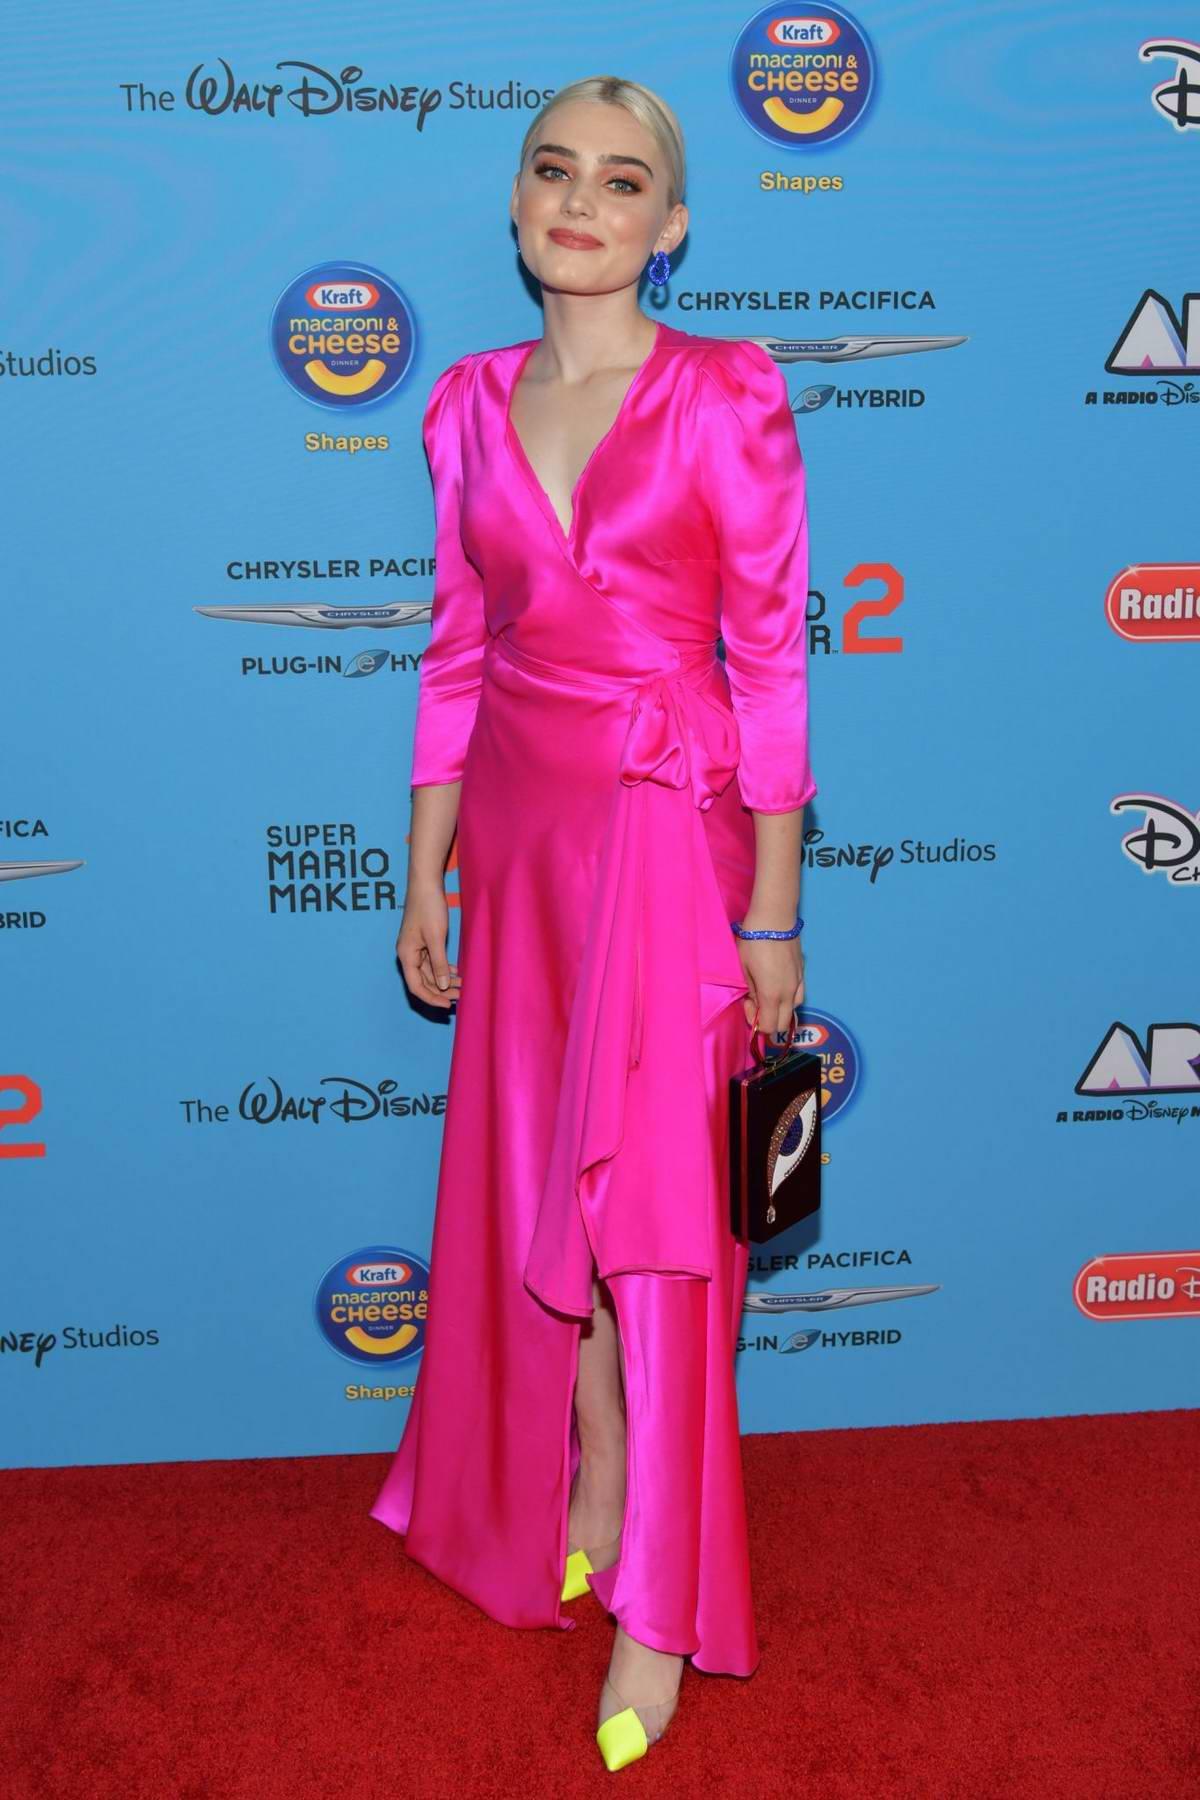 Meg Donnelly attends the 2019 Radio Disney Music Awards (ARDYs 2019) at the CBS Radford Studios in Studio City, California